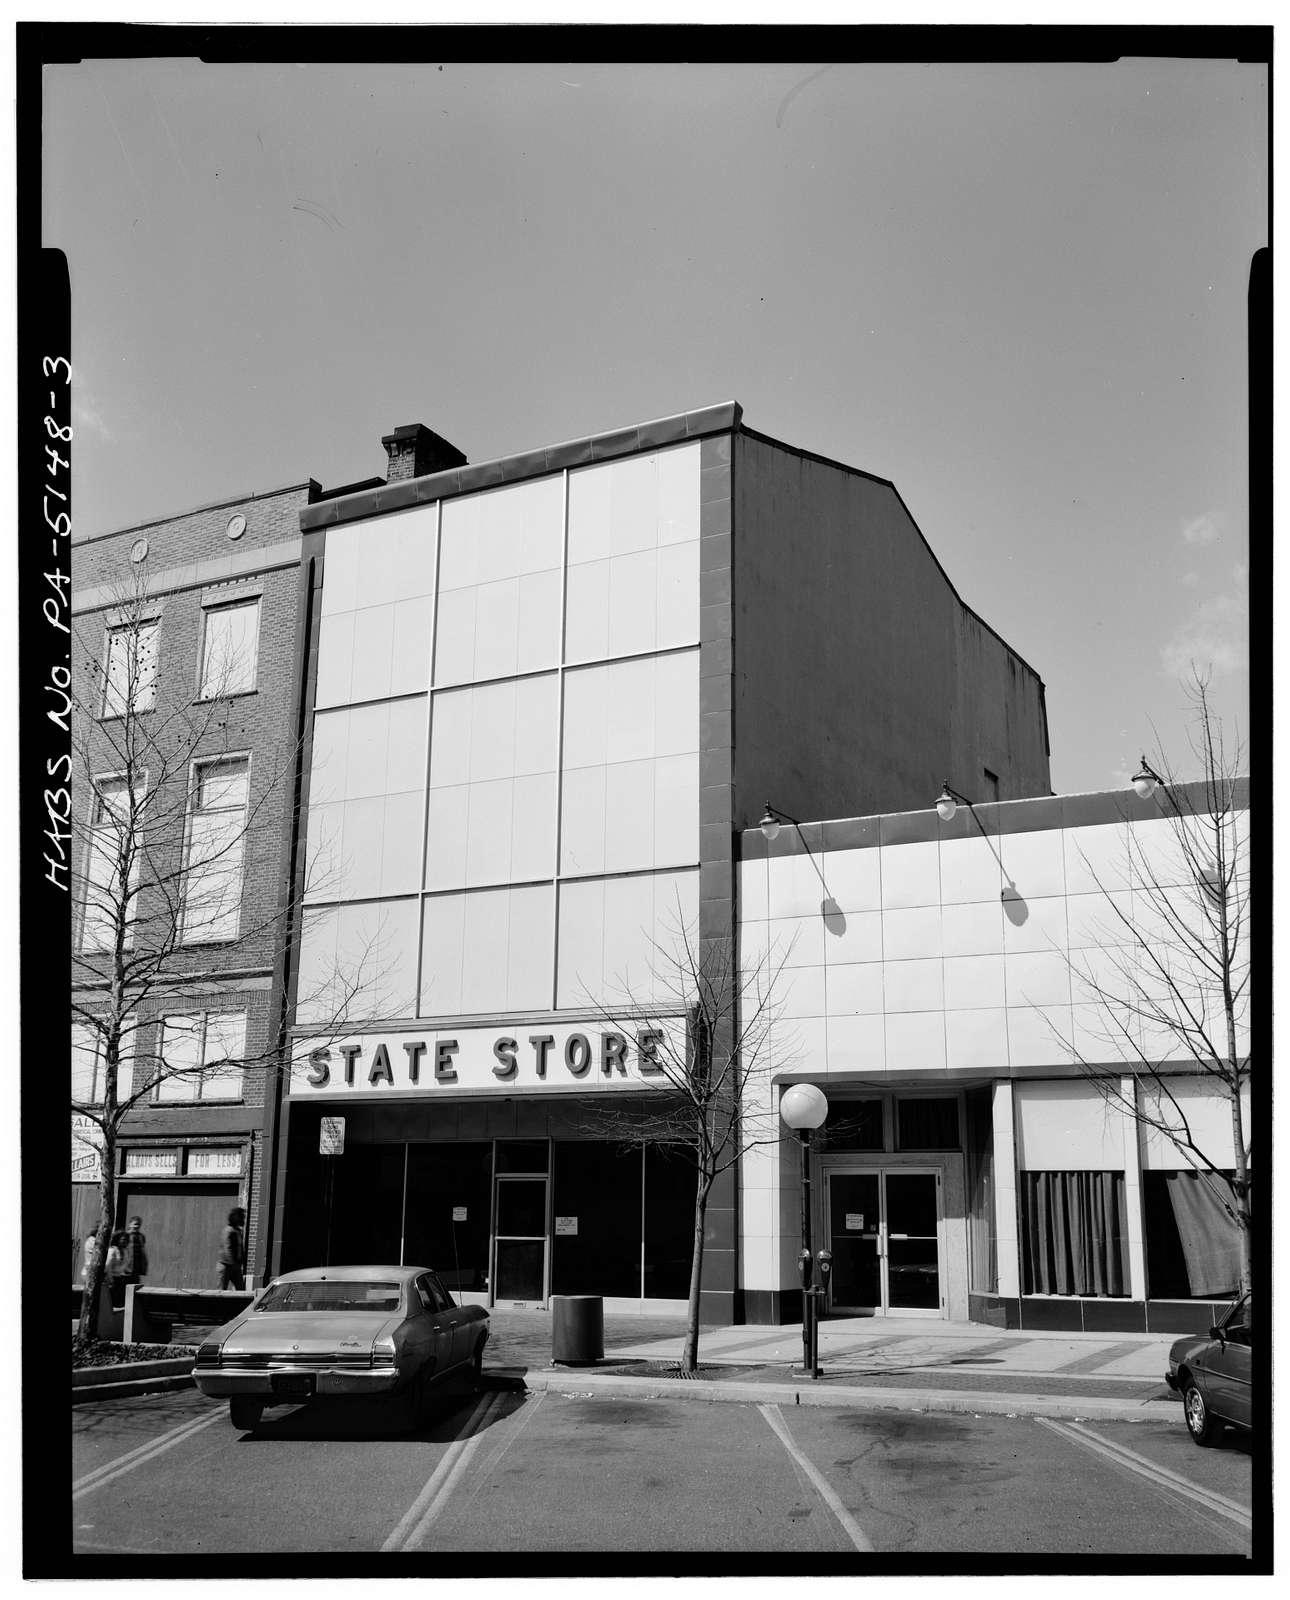 The Rennas Hotel, 403 Penn Street, Reading, Berks County, PA